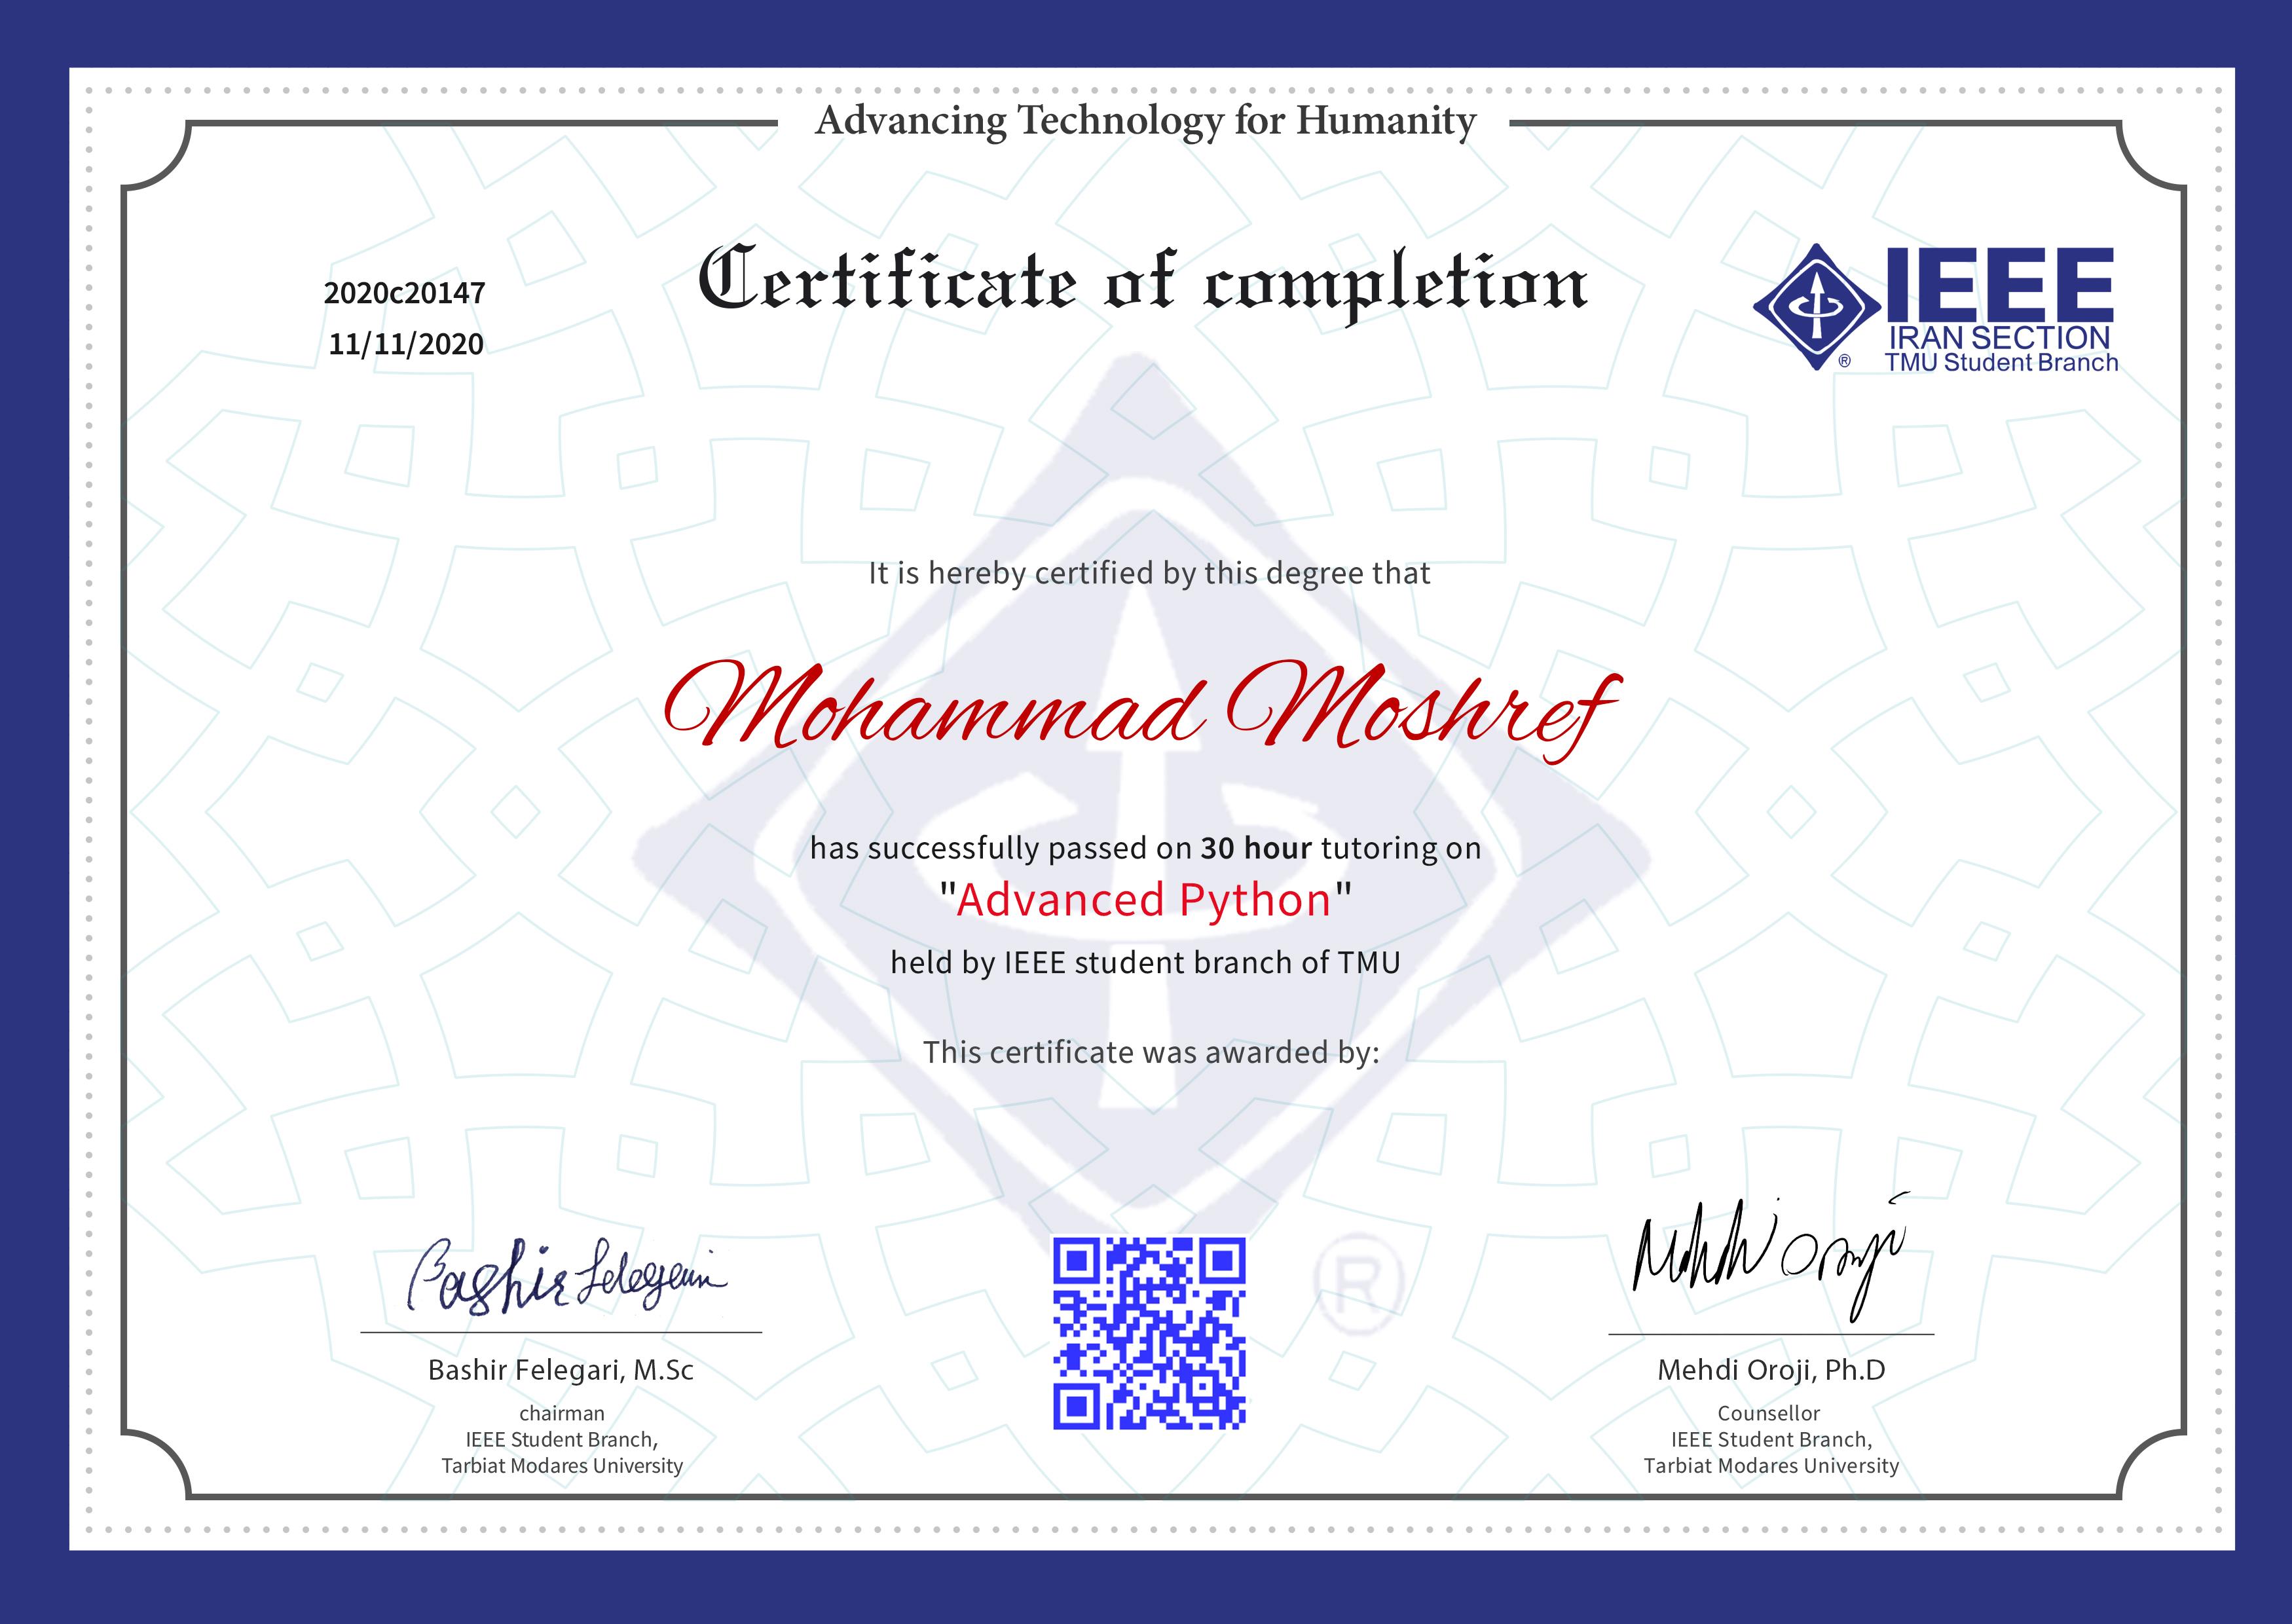 Mohammad Moshref